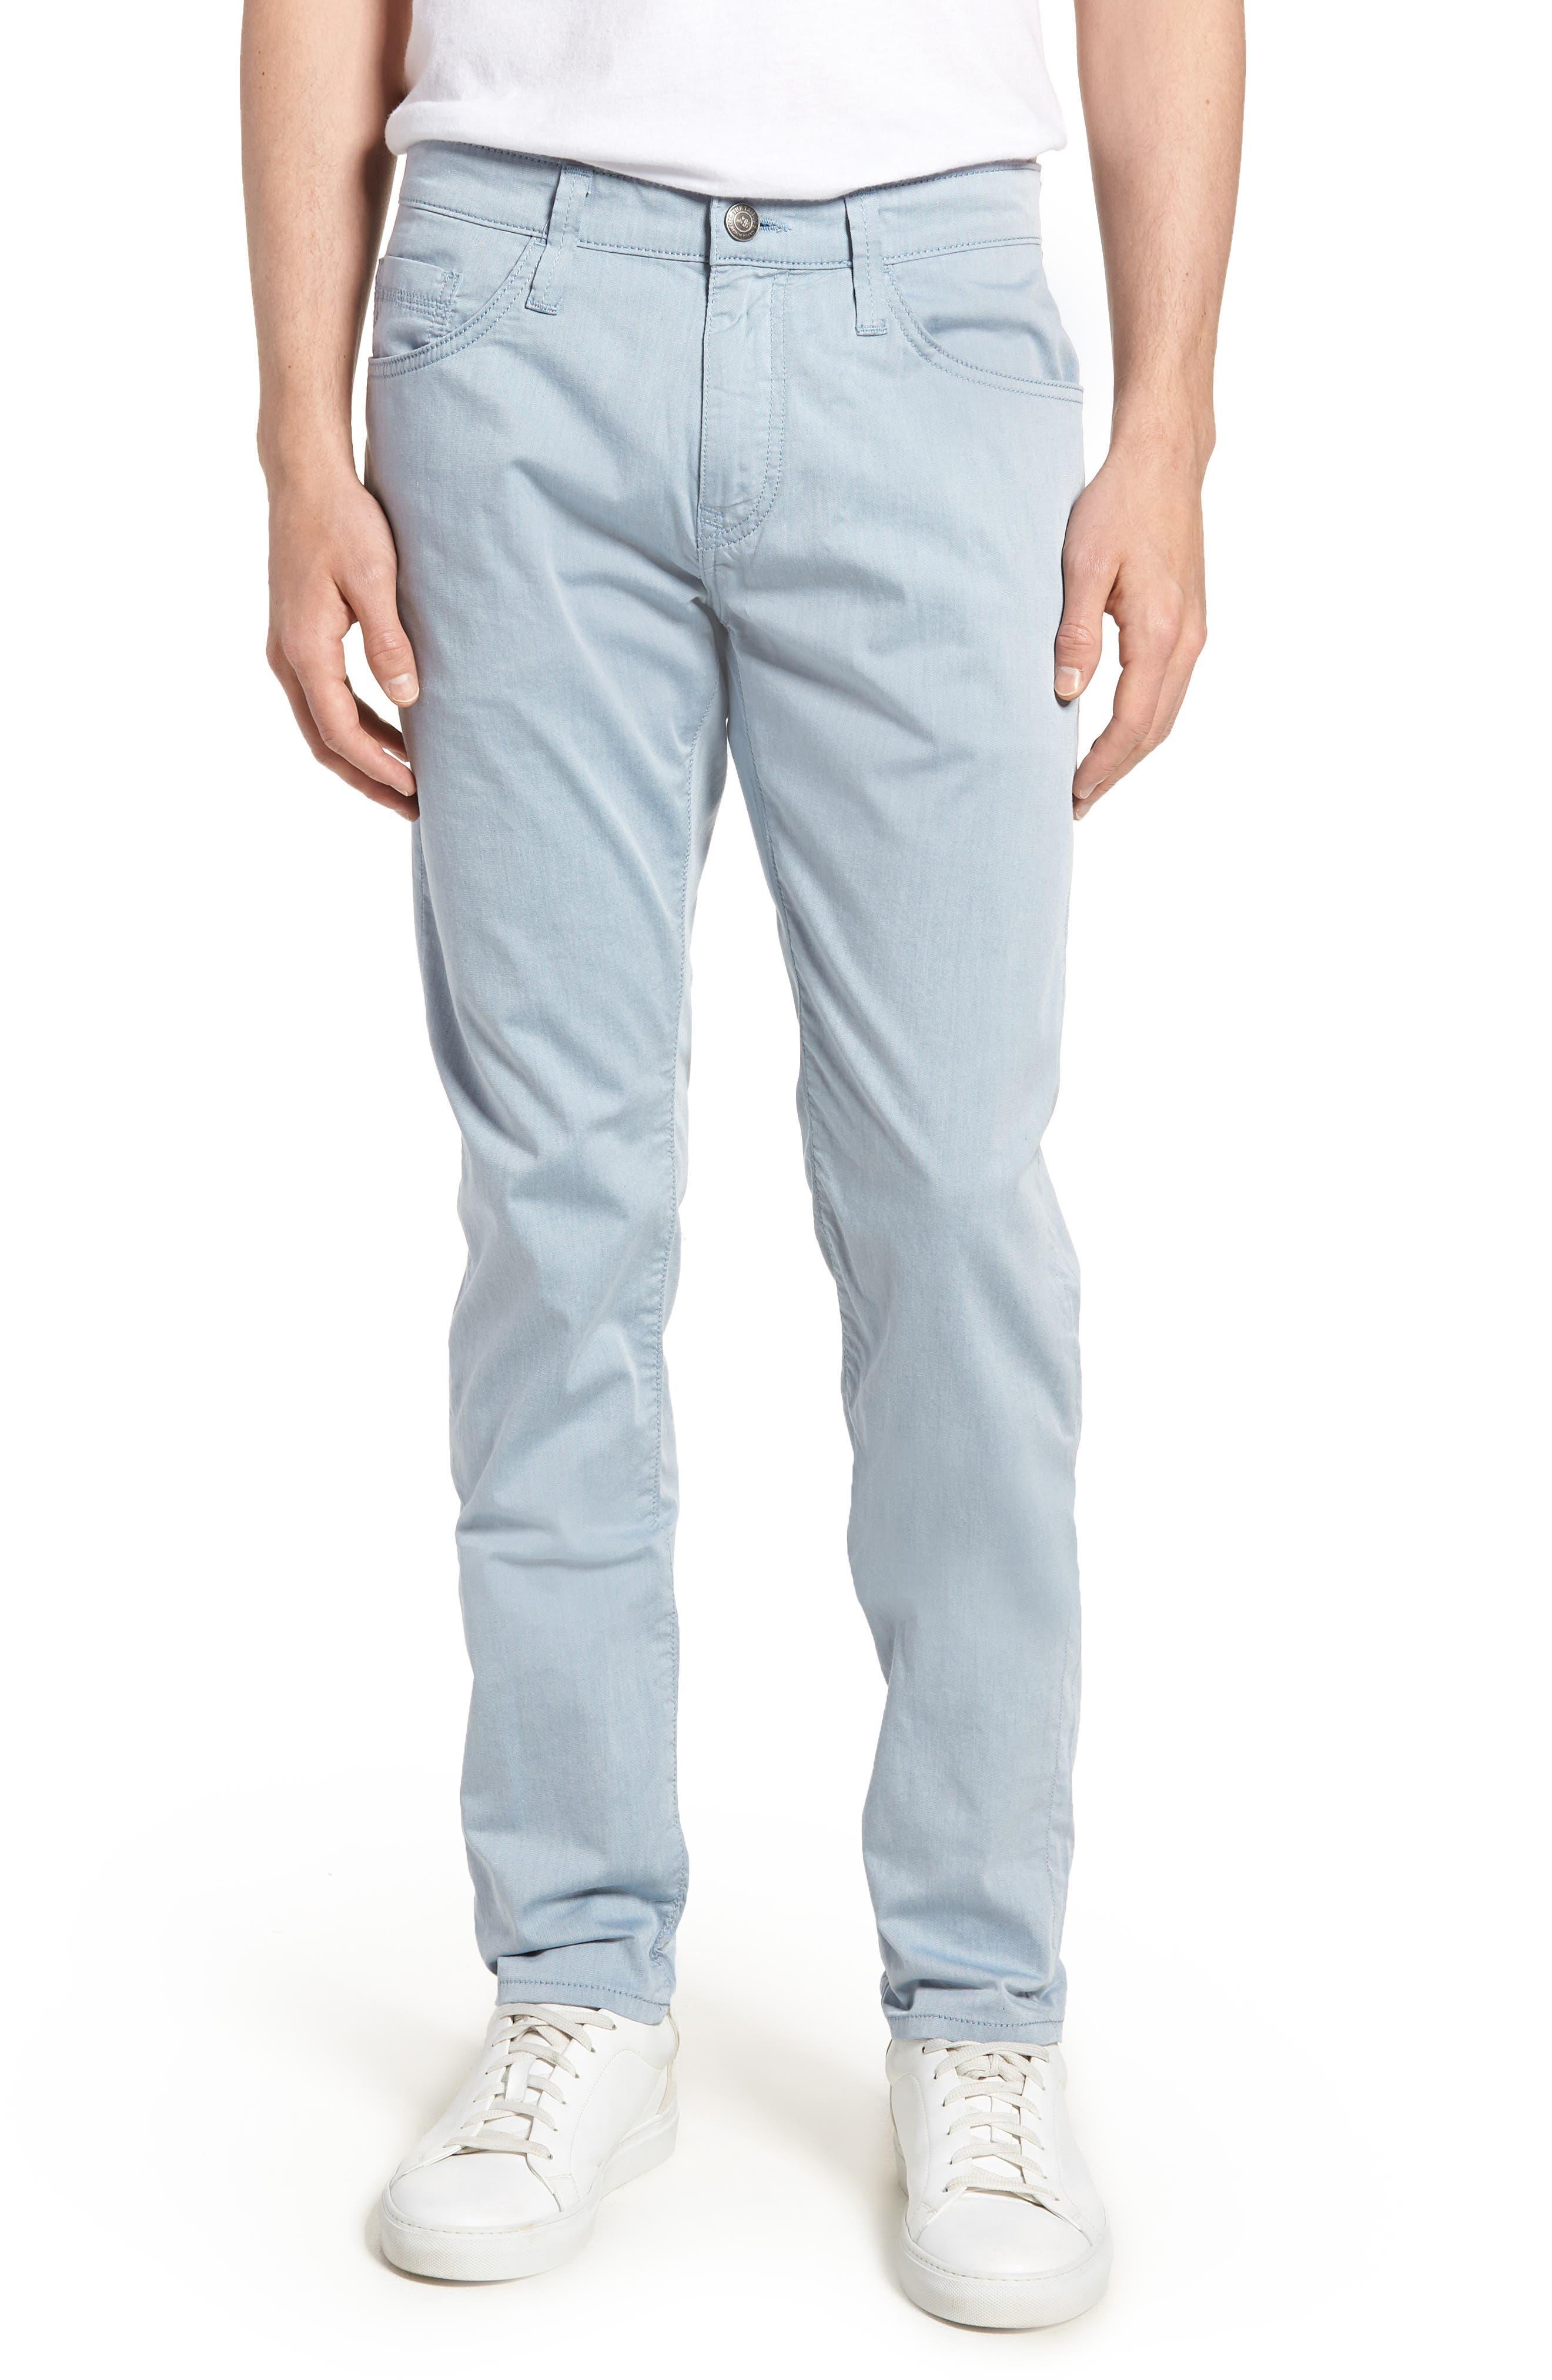 Jake Slim Fit Jeans,                             Main thumbnail 1, color,                             Blue Reversed